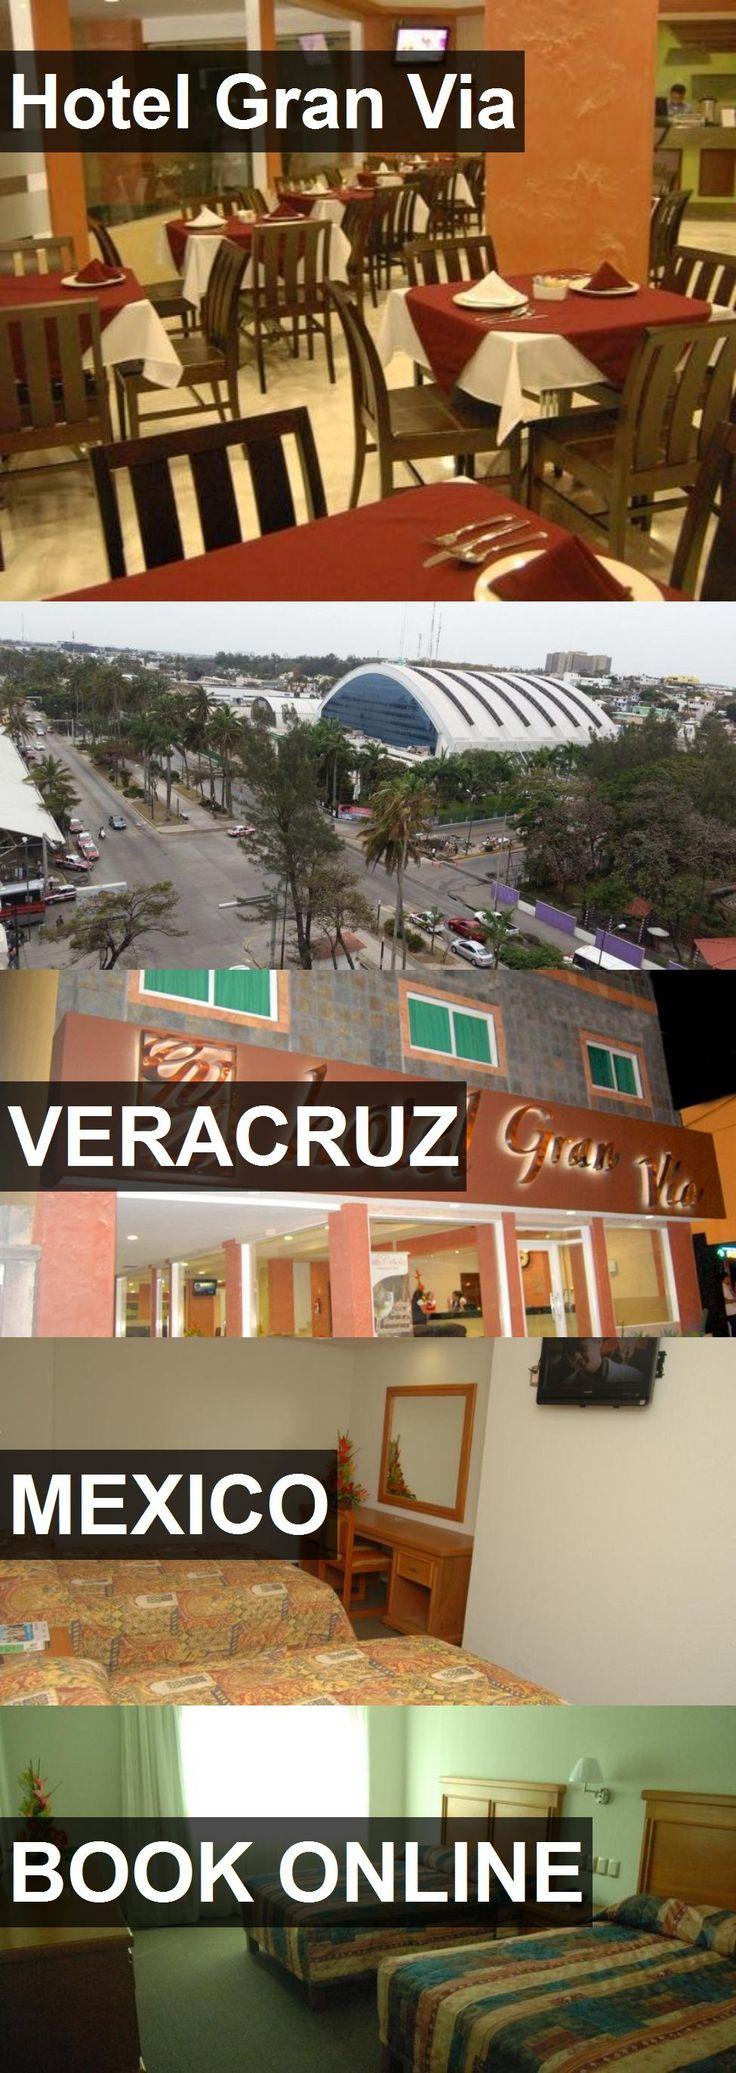 Hotel Gran Via in Veracruz, Mexico. For more information, photos, reviews and best prices please follow the link. #Mexico #Veracruz #travel #vacation #hotel